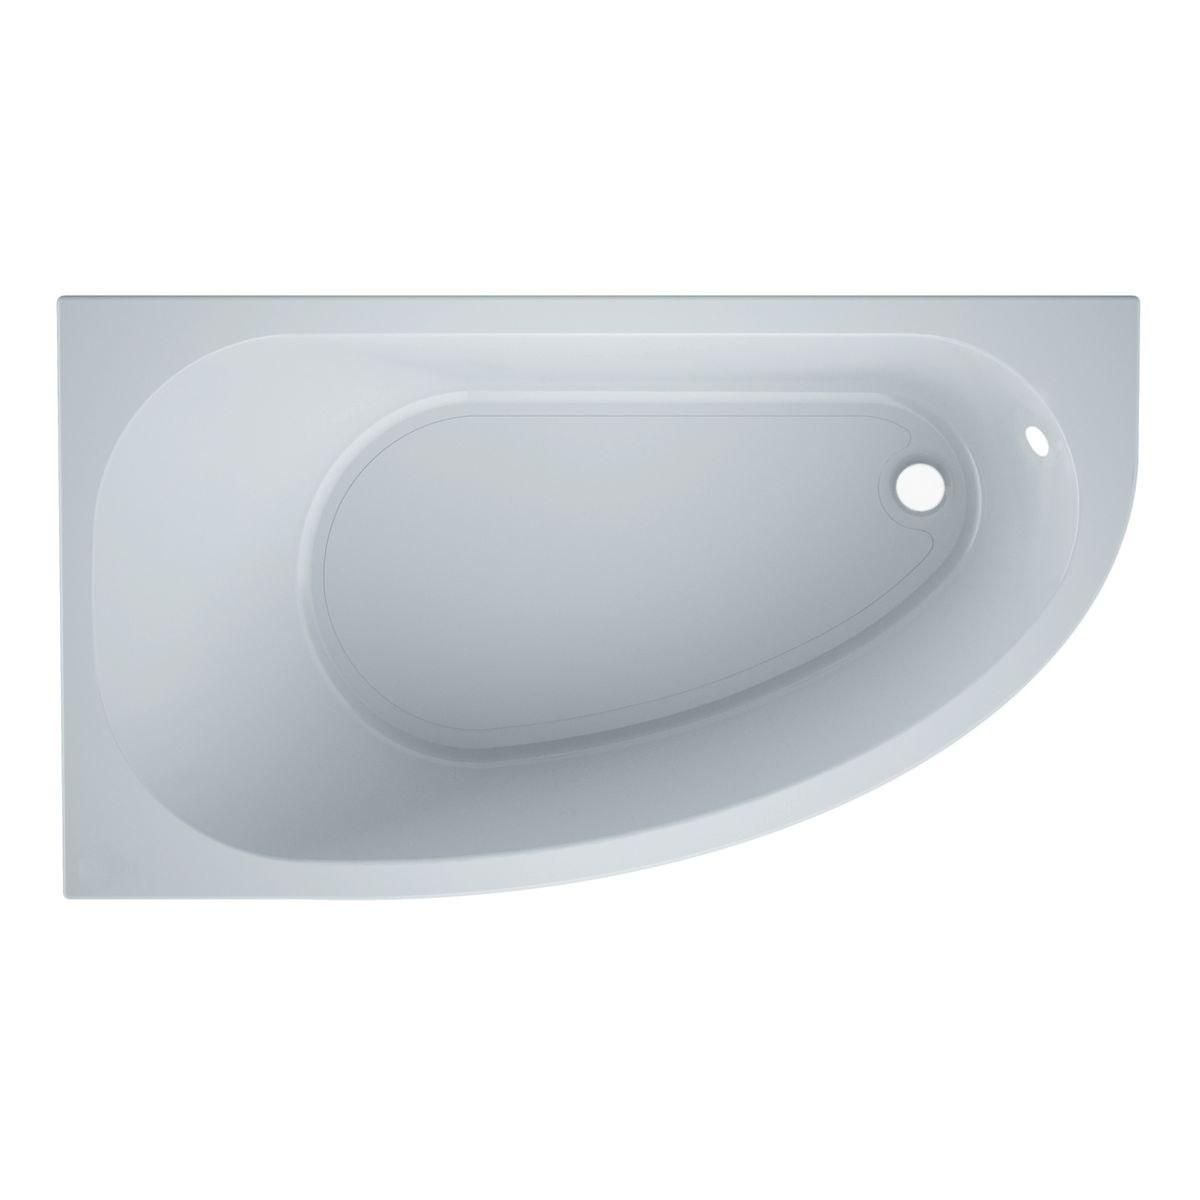 Vasca da bagno quadrata top capri with vasca da bagno for Livella a bolla leroy merlin